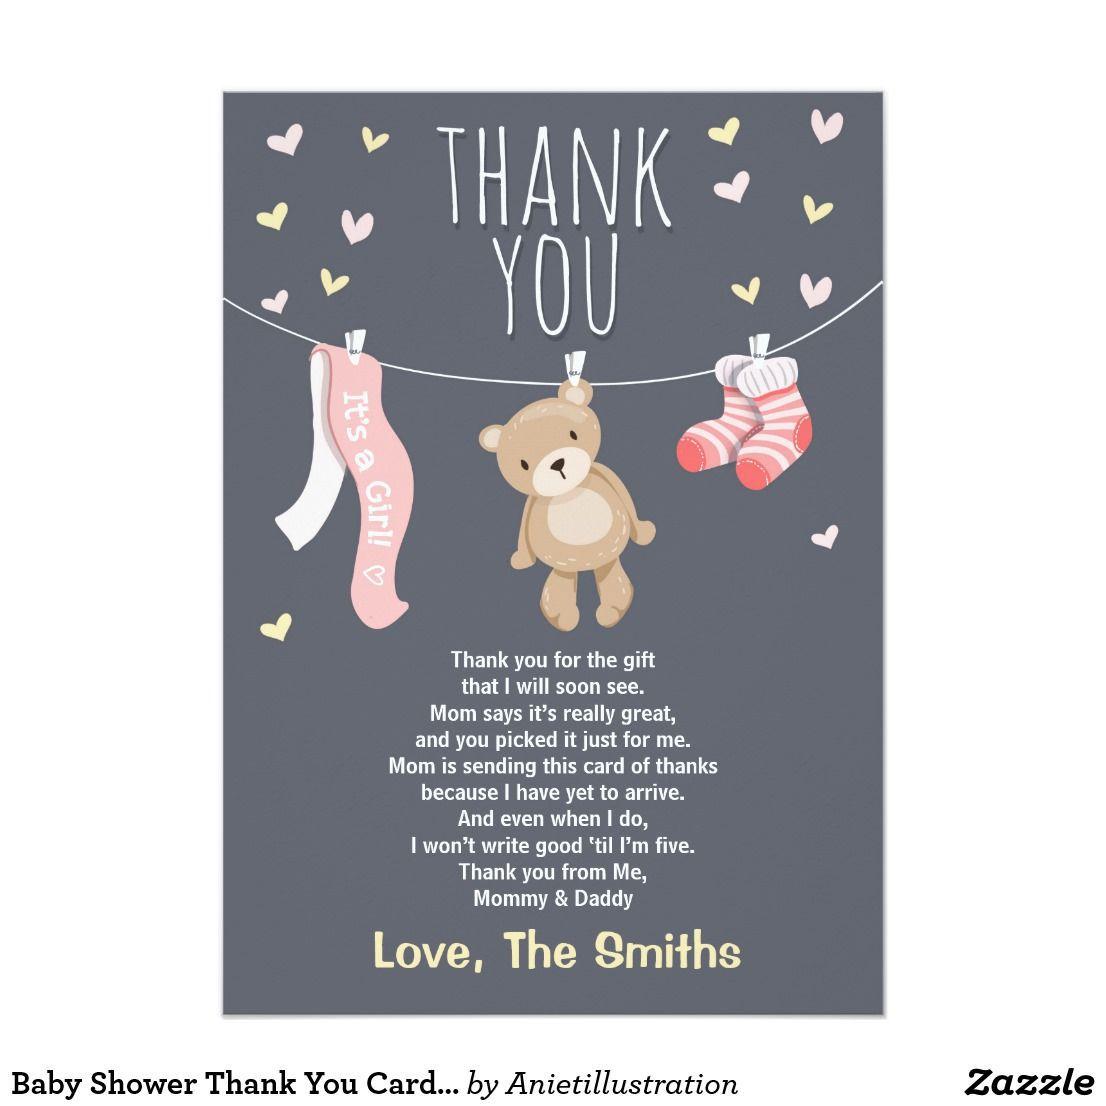 004 Astounding Thank You Card Wording Baby Shower Gift High Resolution  For Multiple GroupFull